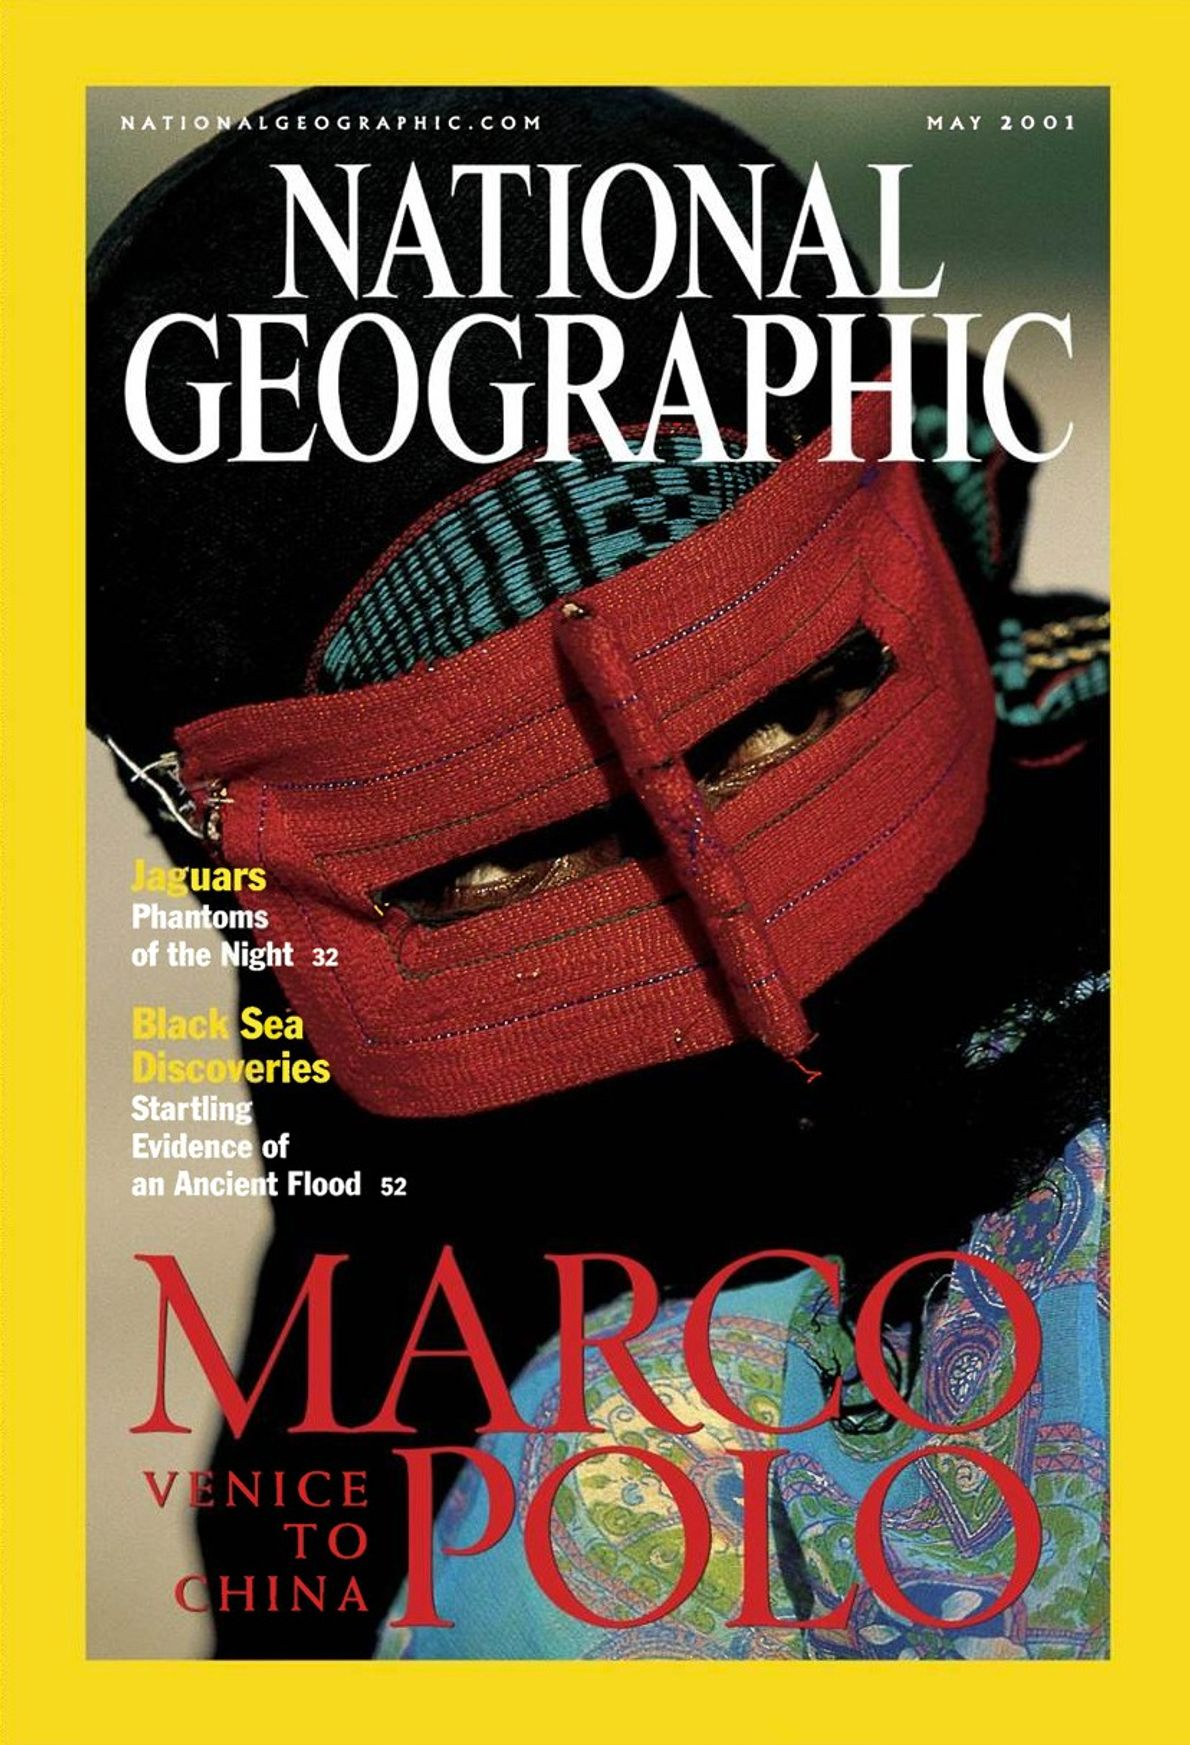 Mayo 2001